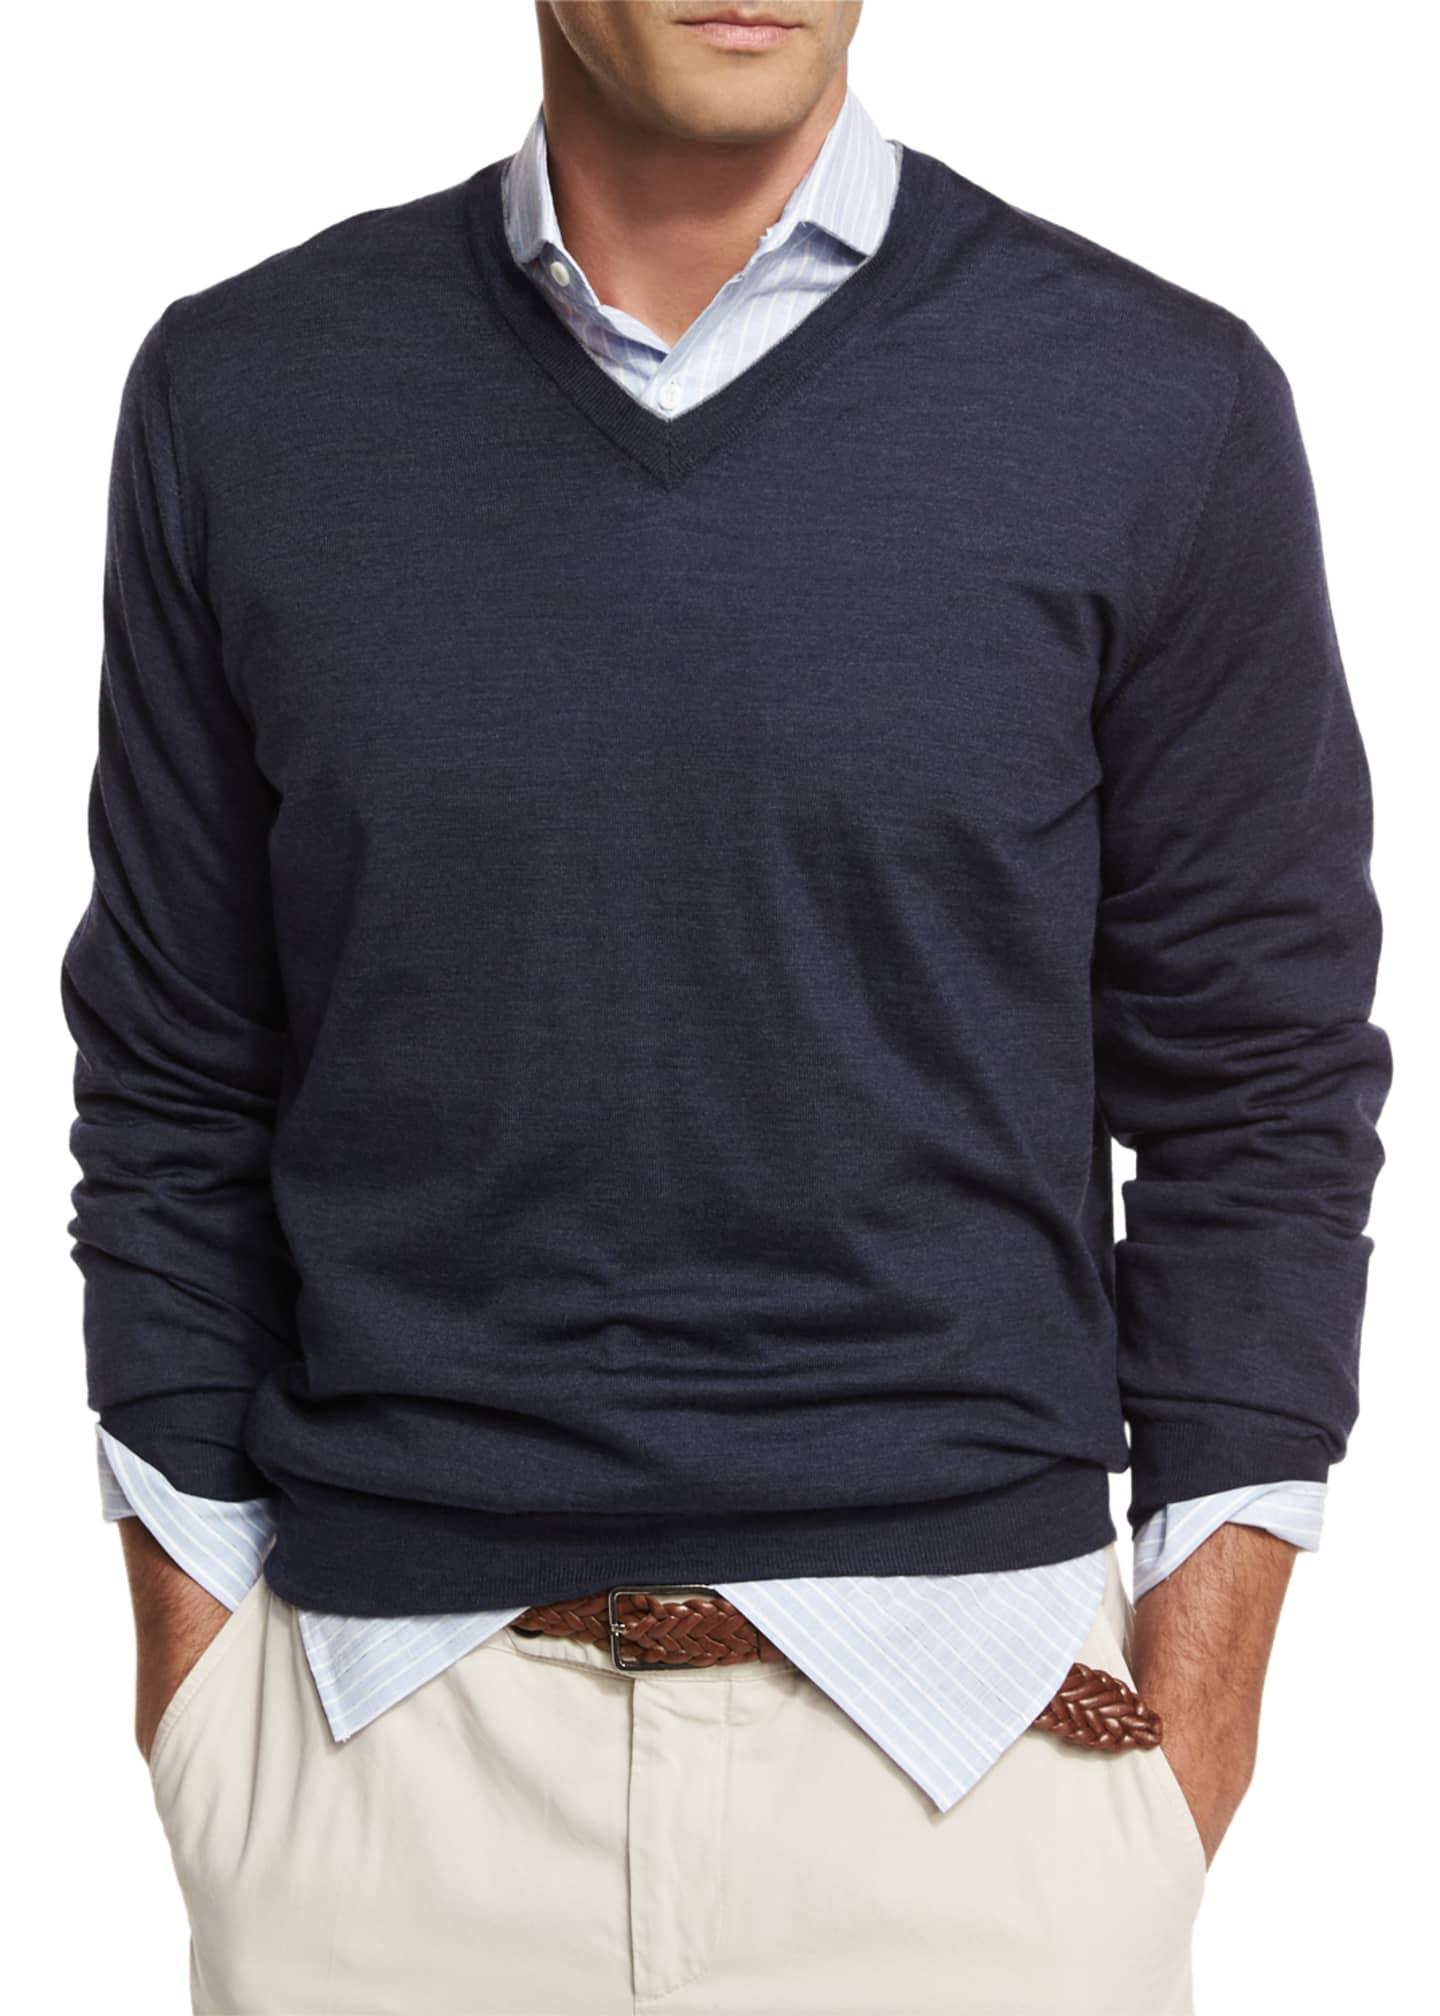 Brunello Cucinelli Fine-Gauge Tipped V-Neck Sweater